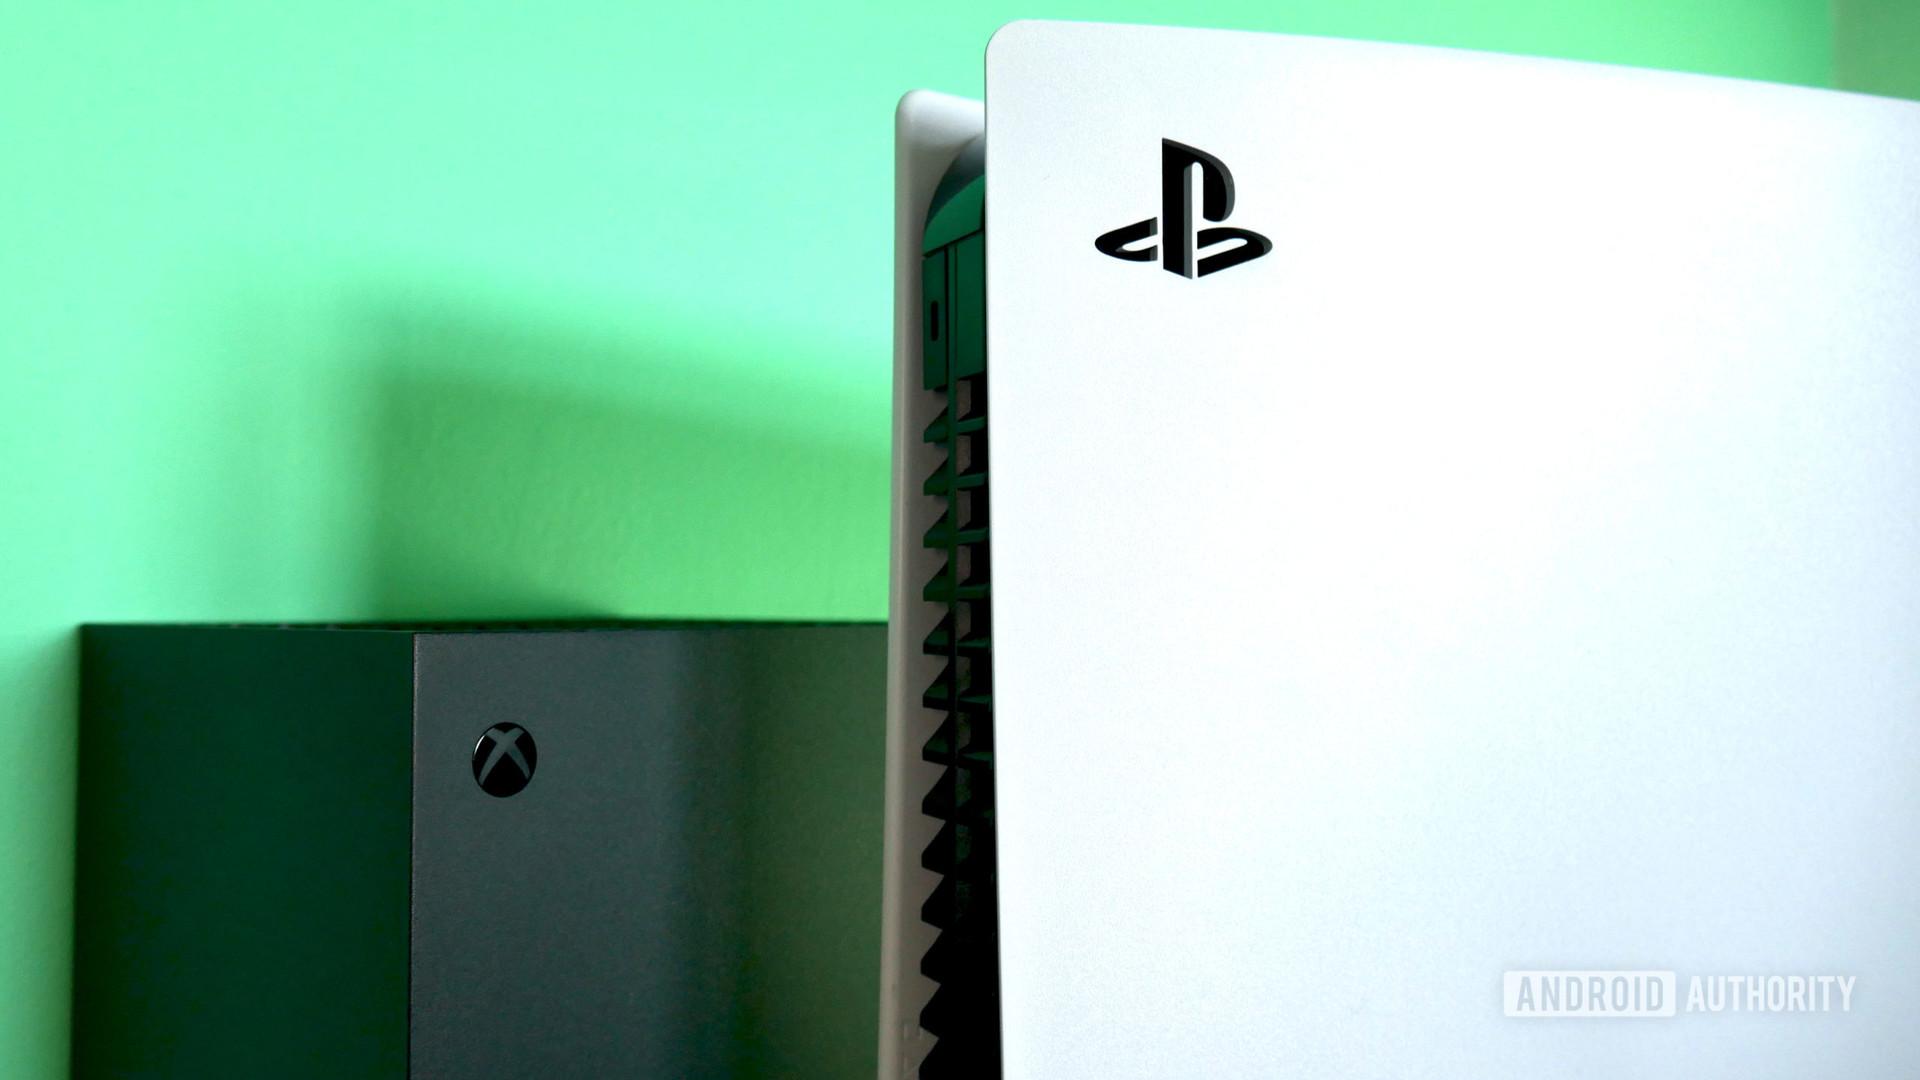 ps5 vs xbox series x logo